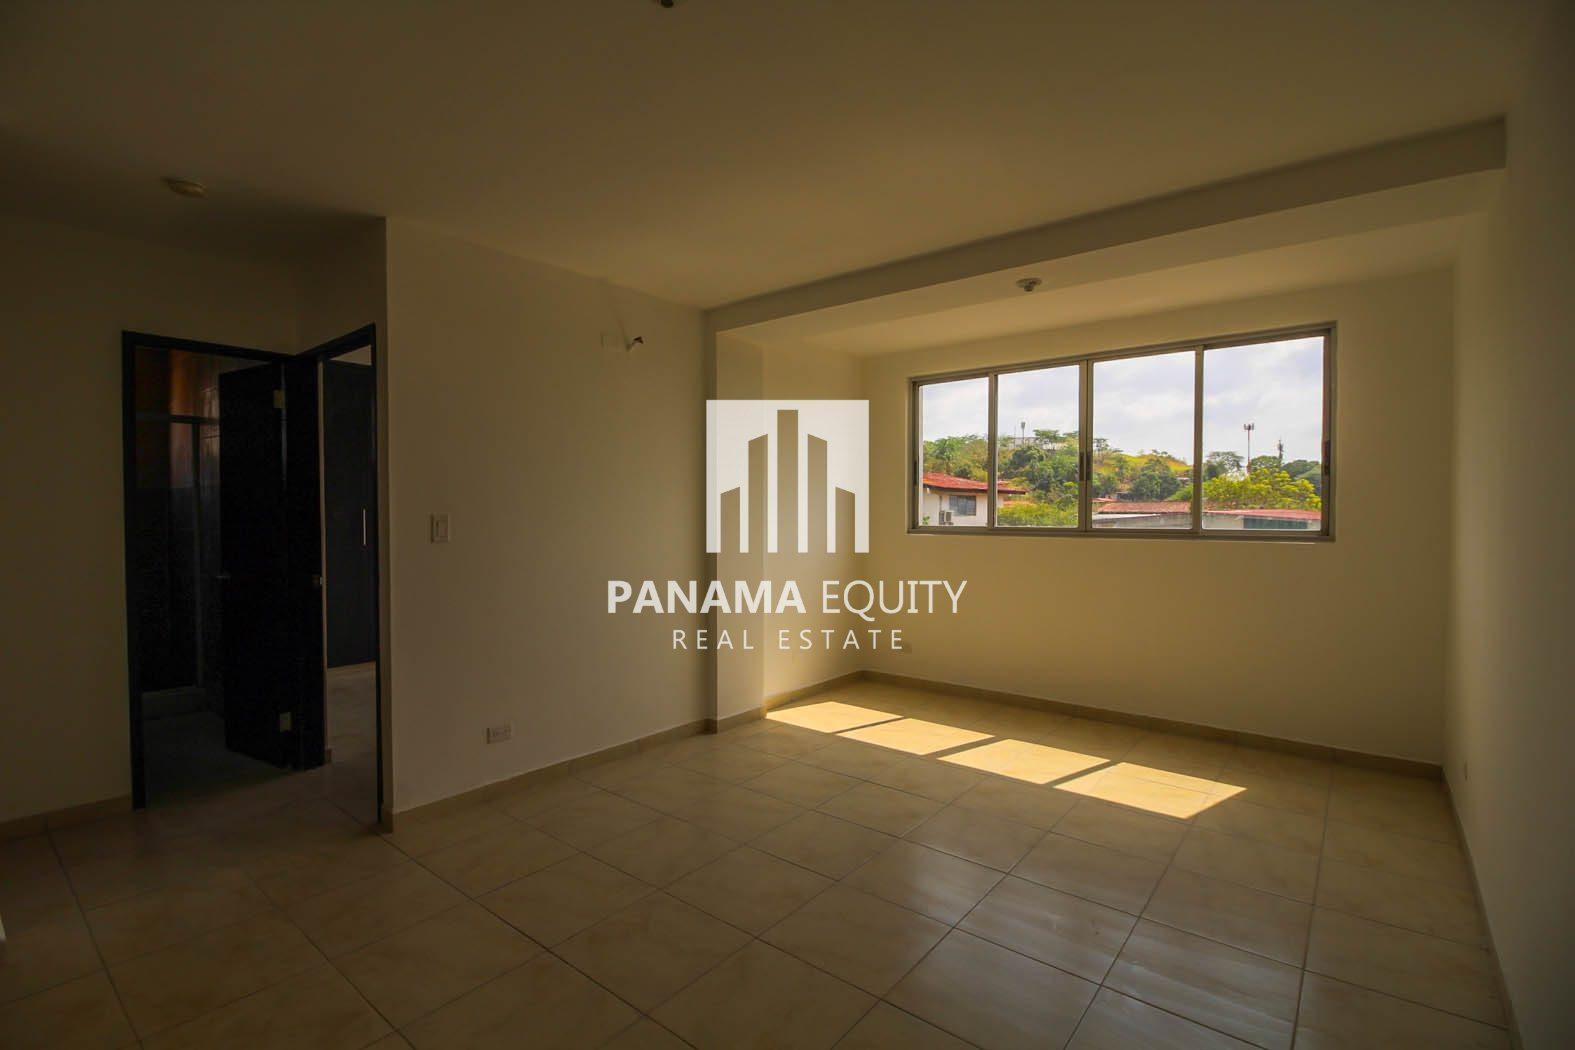 Charming Miraflores Apartment Panama Equity